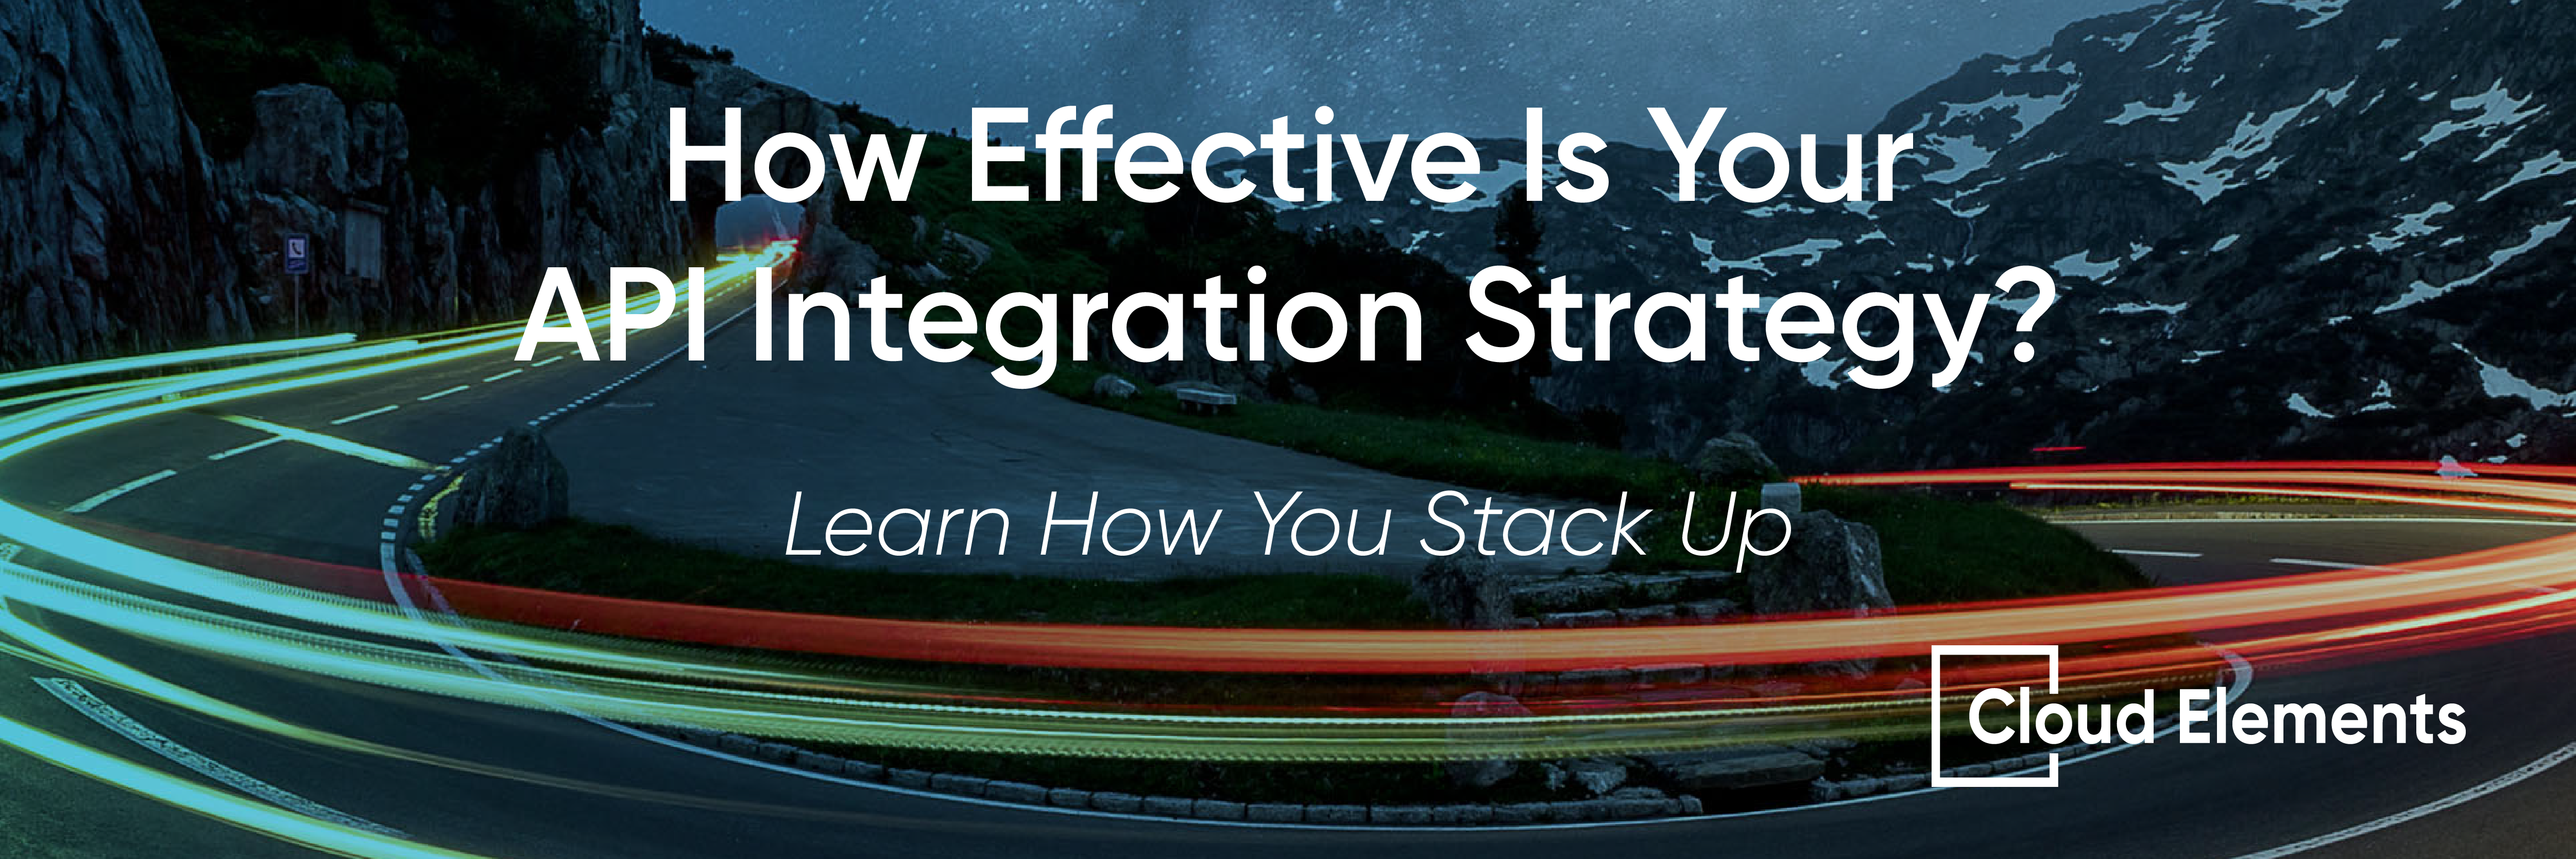 api integration strategy